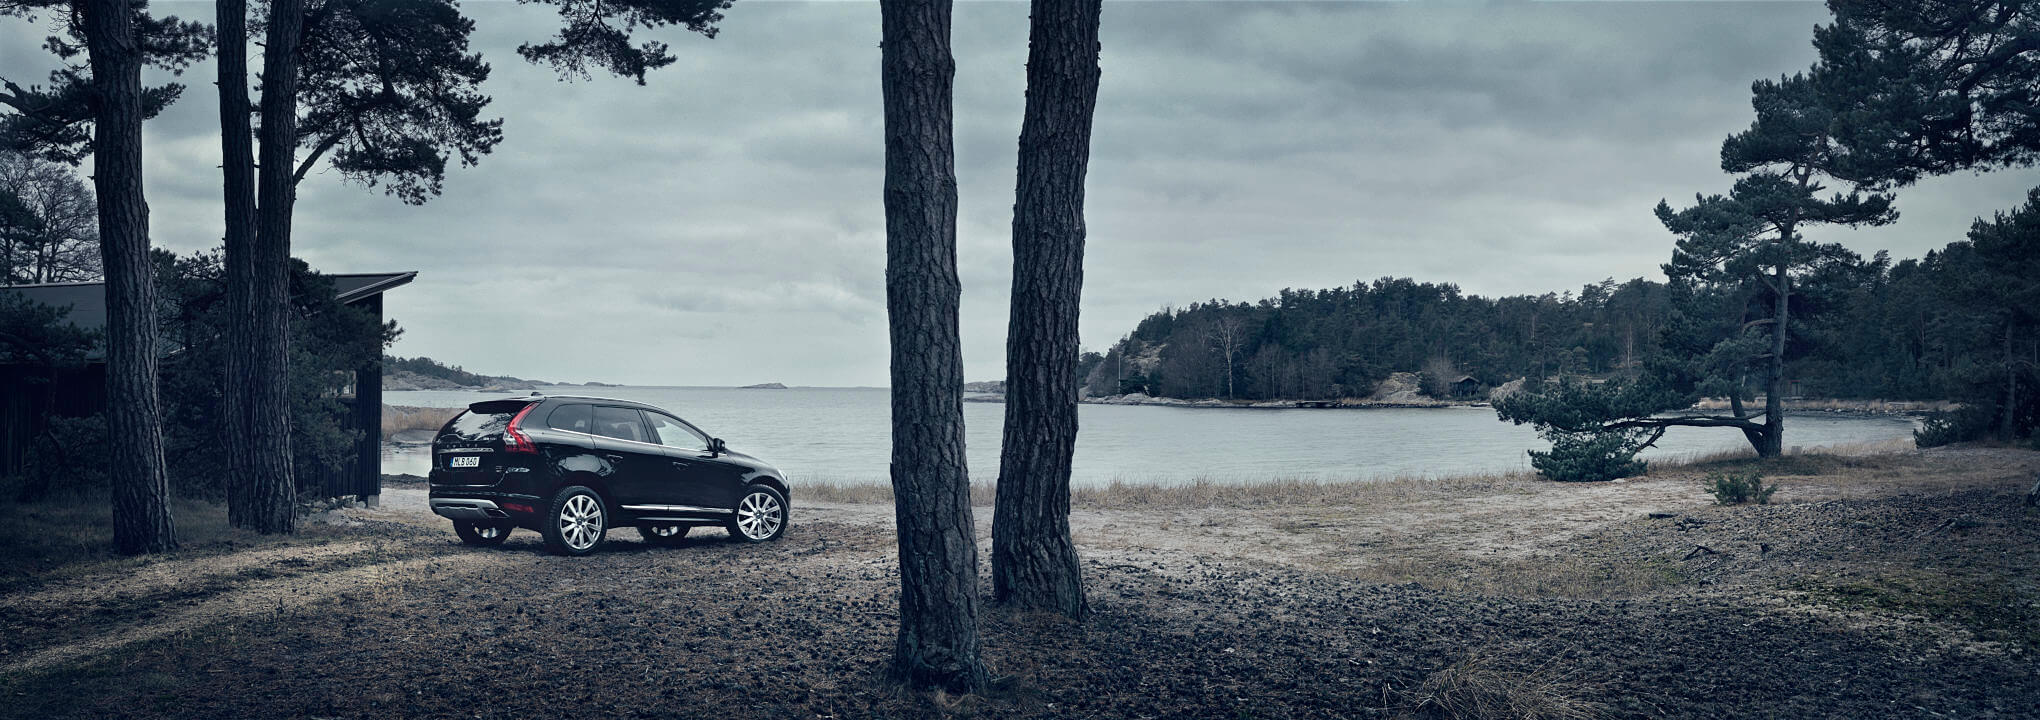 Volvo Made By Sweden Södermanland